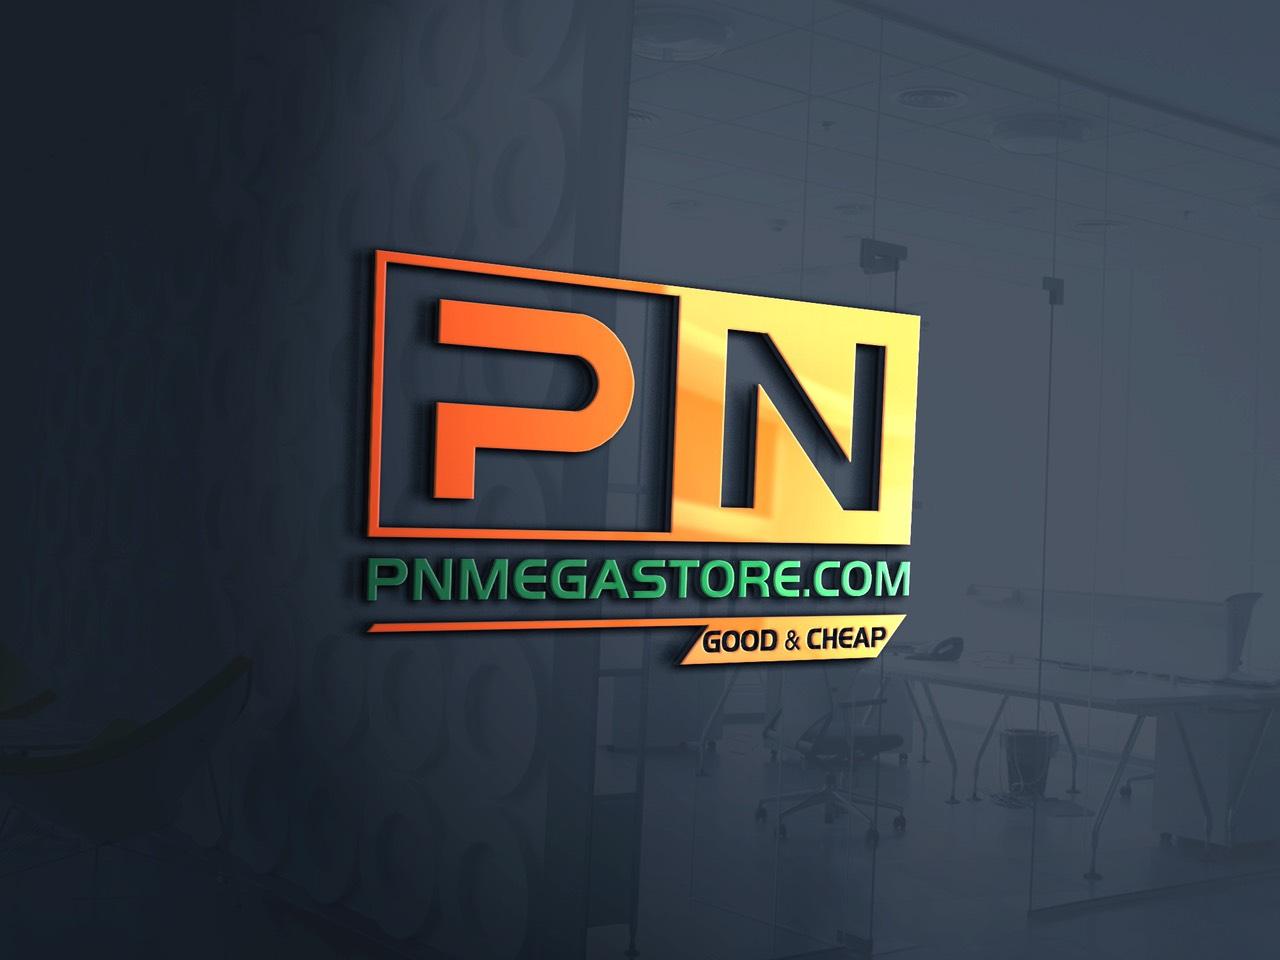 Logo PN Megastore 2